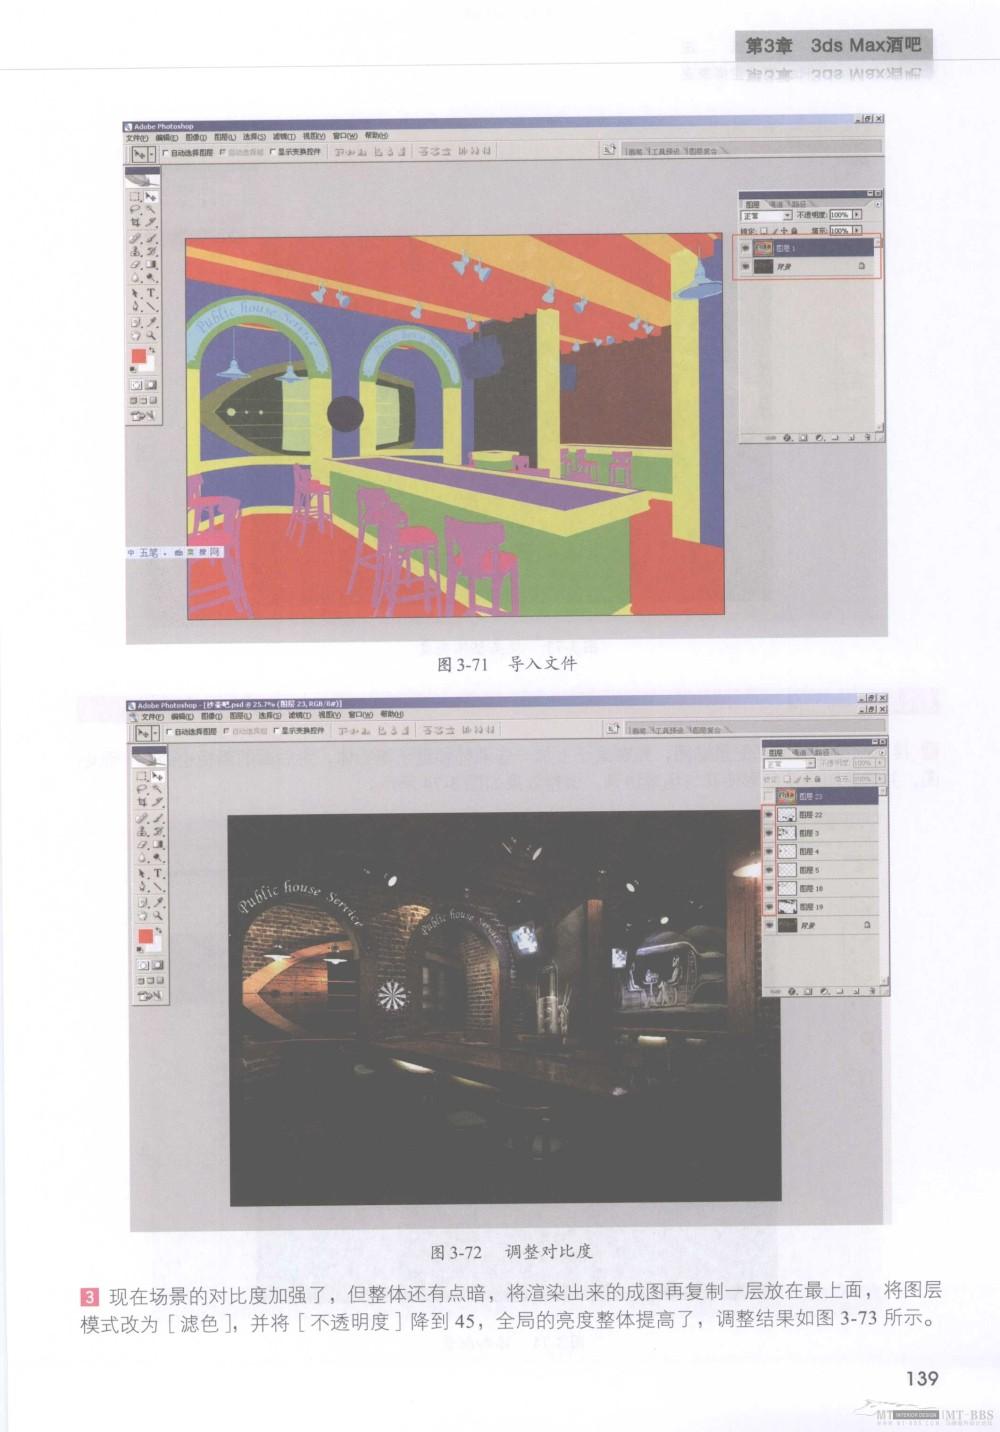 水晶石技法-3ds_Max&VRay室内空间表现_水晶石技法-3ds_Max&VRay室内空间表现_页面_145.jpg